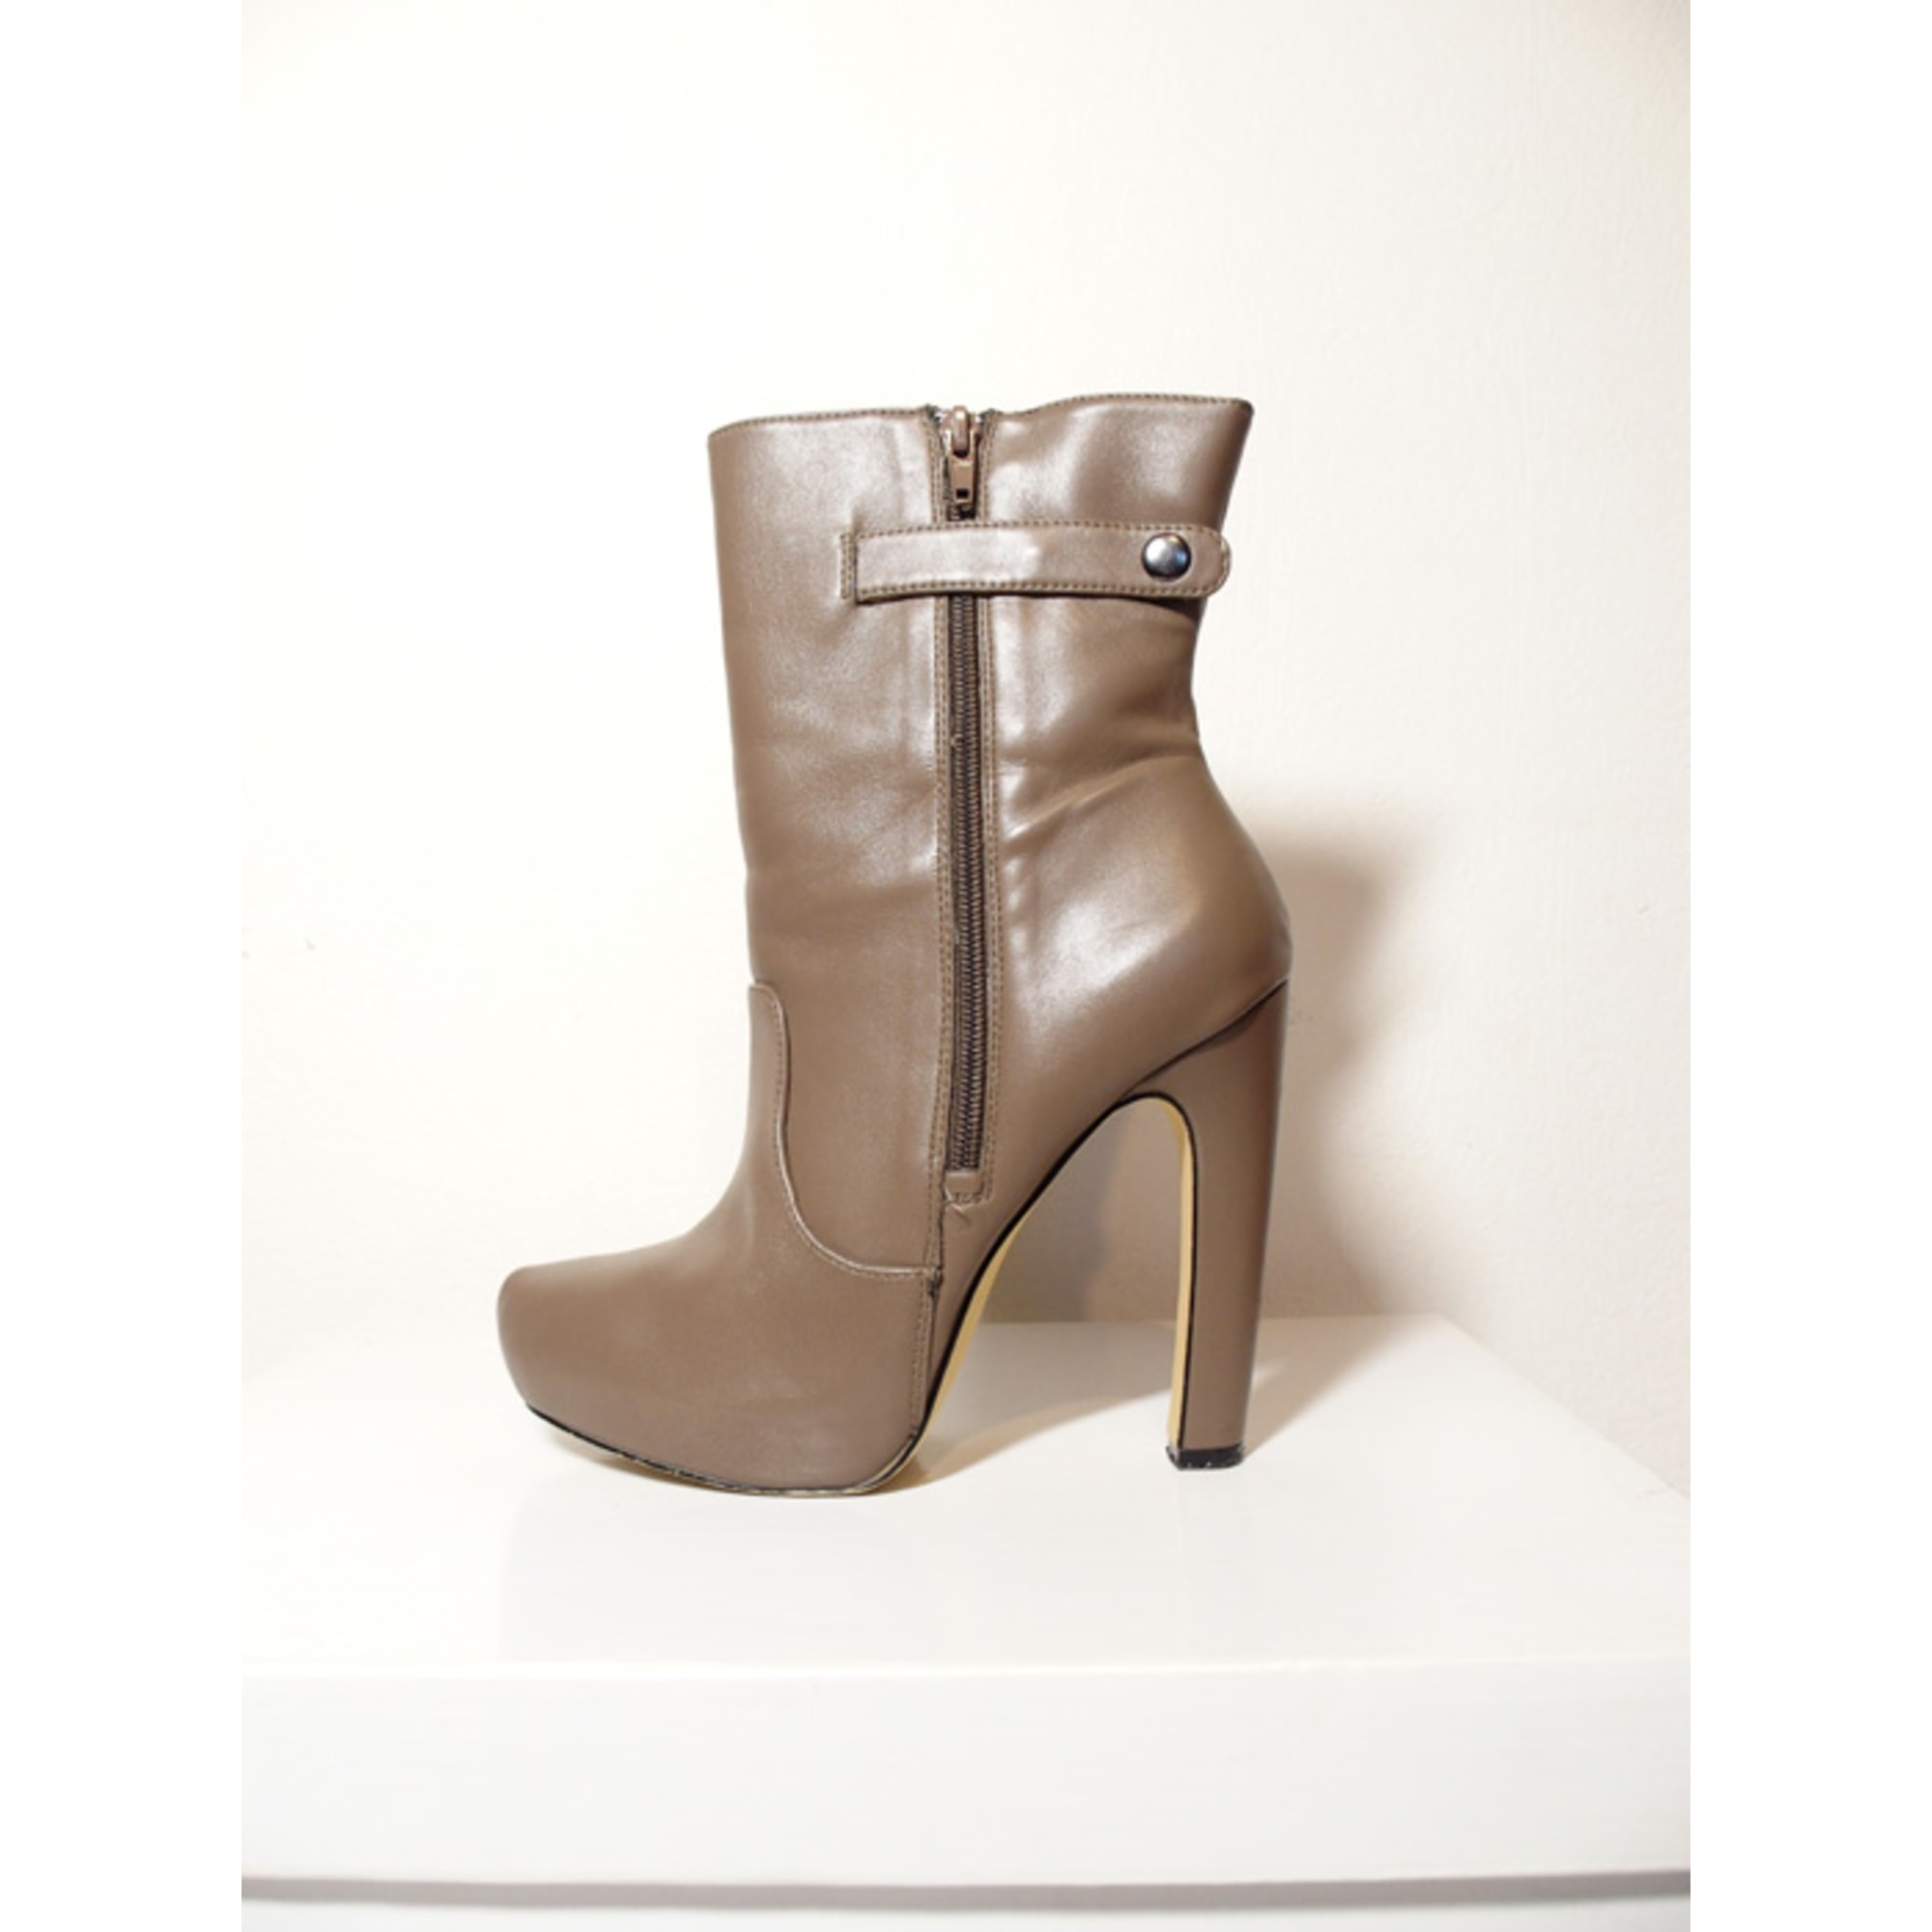 Bottines & low boots à talons JUSTFAB Beige, camel